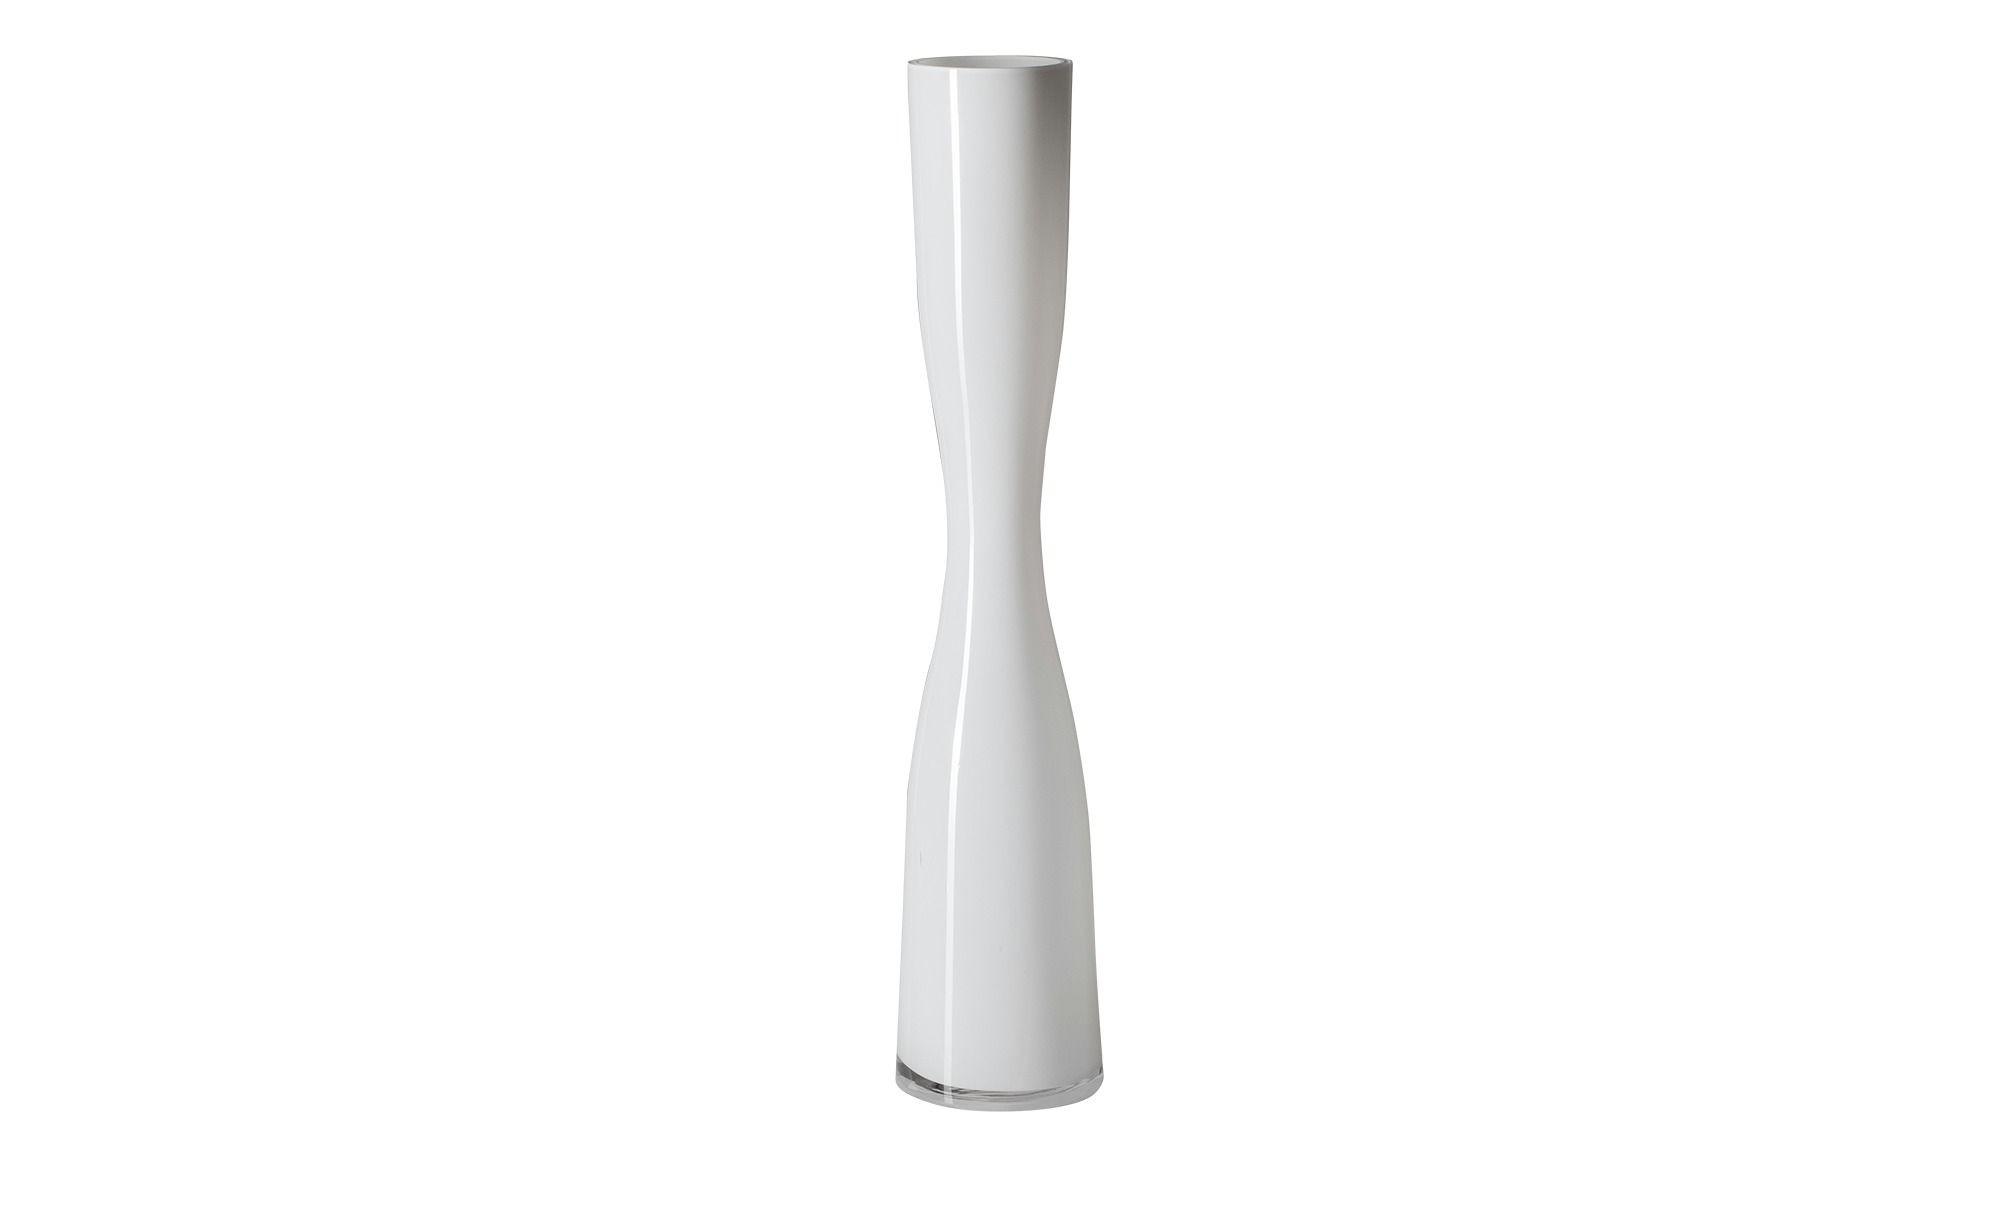 white ceramic geometric vase of 5211 zoom 2 000ac2971 222 pixel vase pinterest for 5211 zoom 2 000ac2971 222 pixel